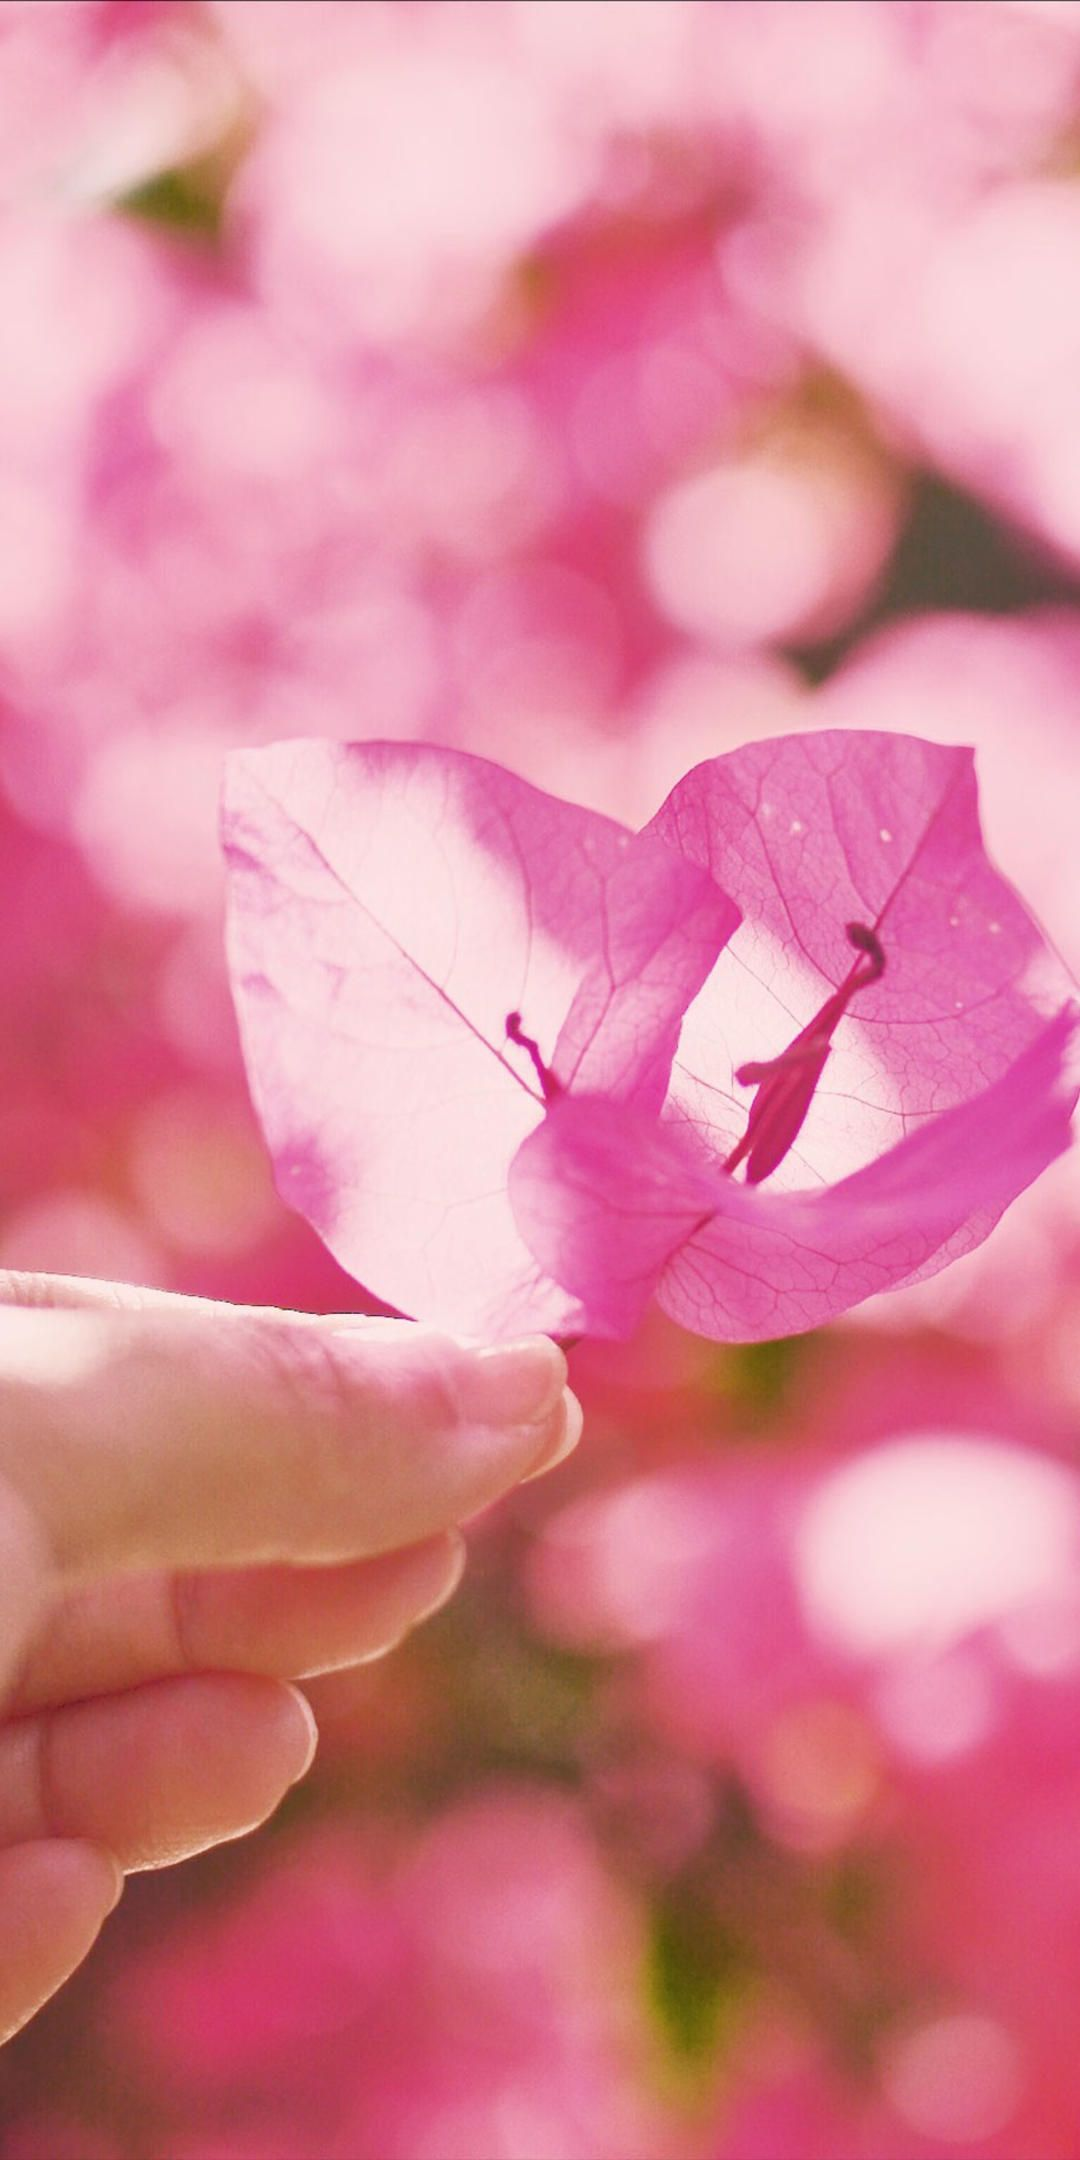 5e67b894e11fa - 粉色系少女心手机壁纸